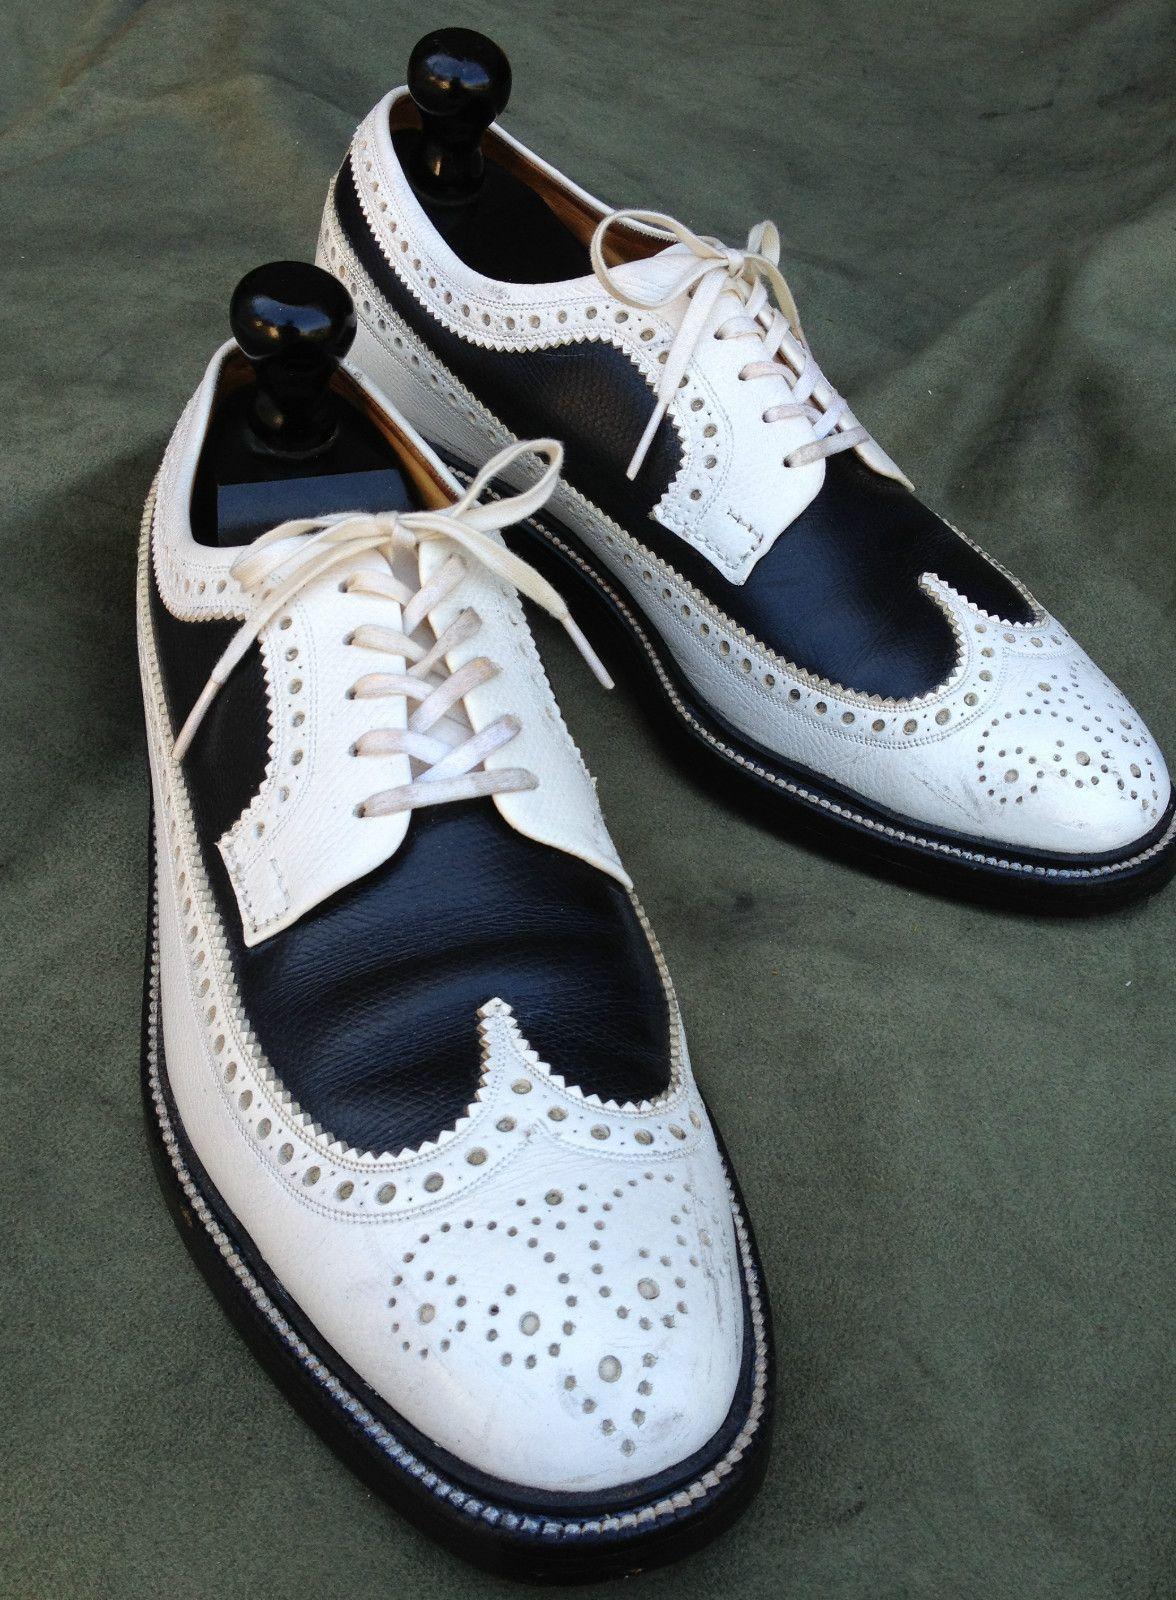 Fashionable mens shoes summer 2014